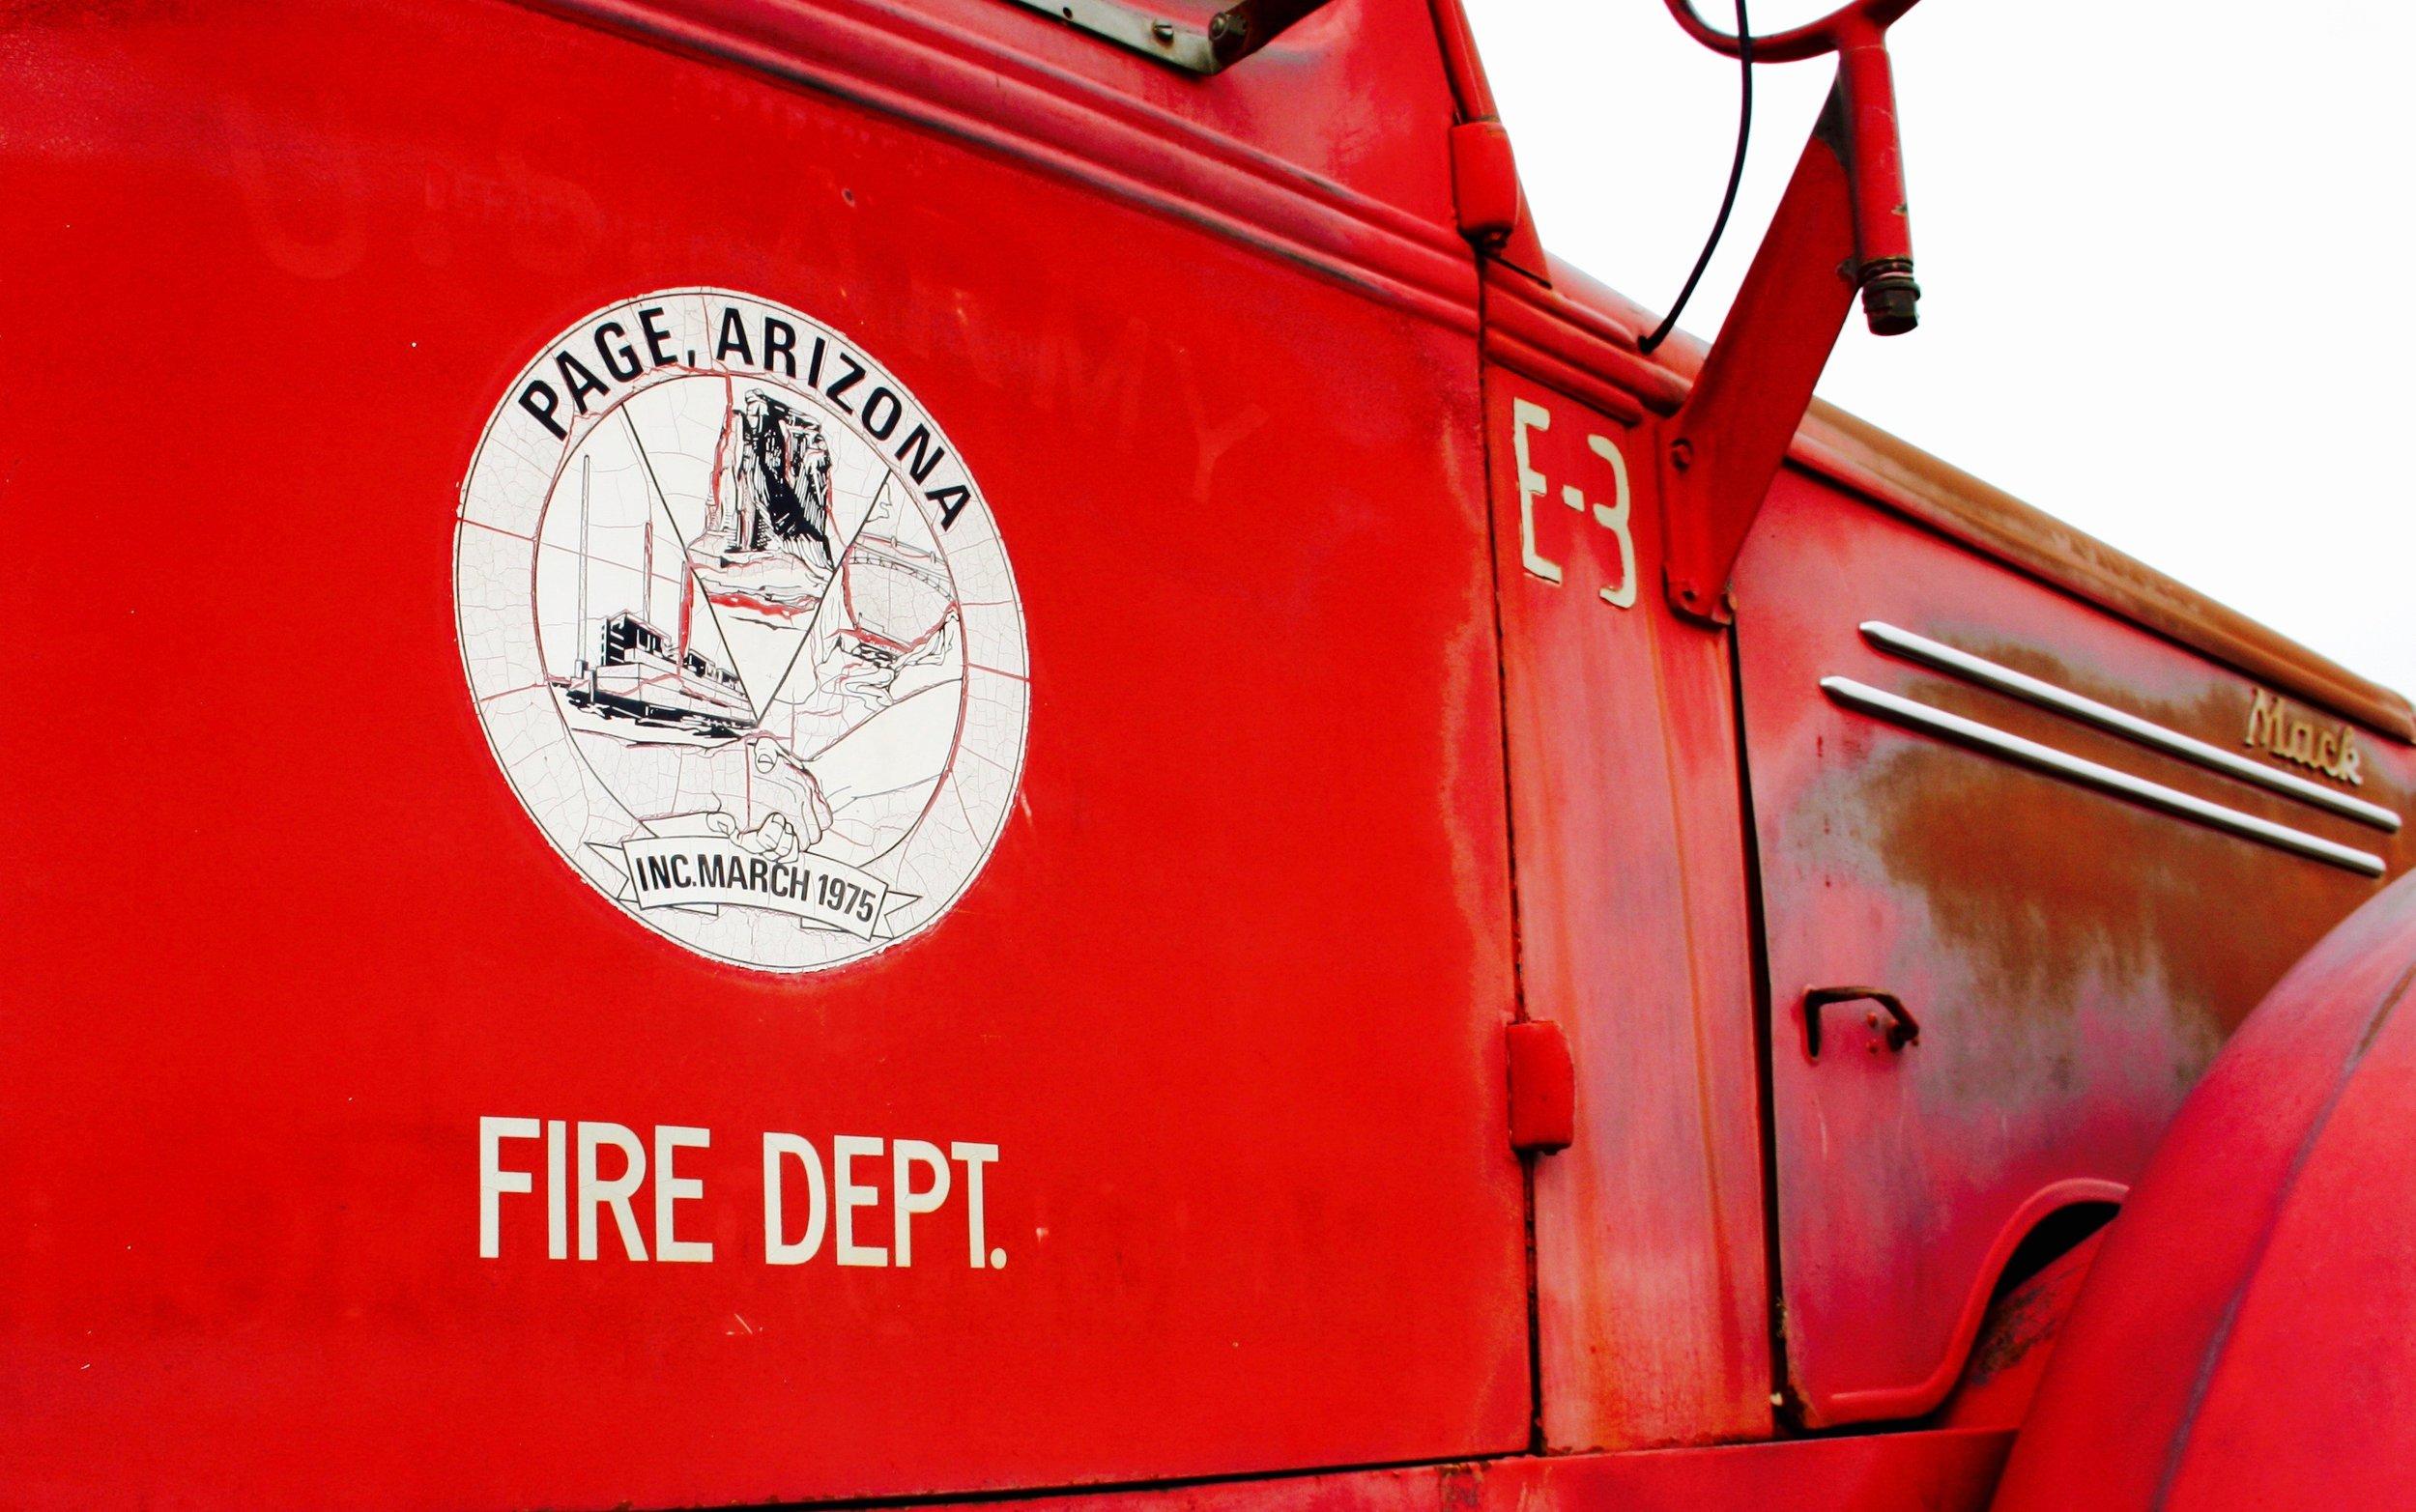 Page, Arizona - Vintage Firetruck - 3 Days*